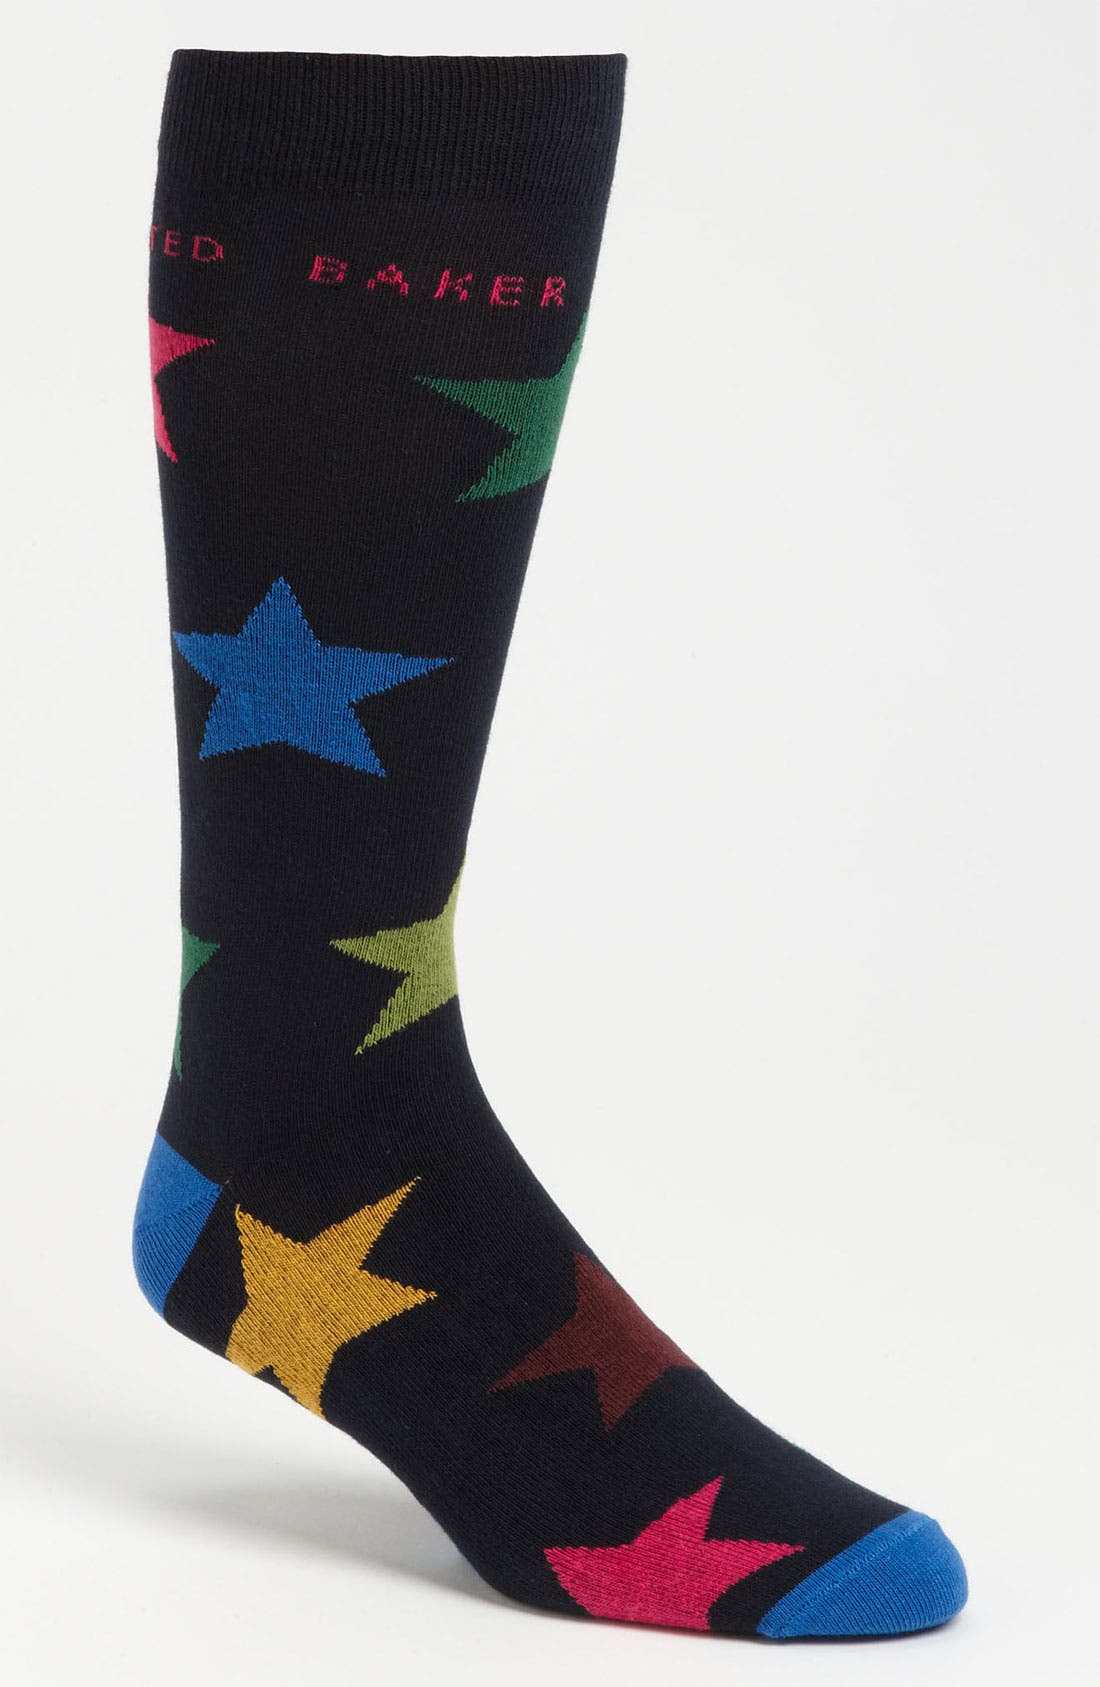 Main Image - Ted Baker London 'Big Star' Socks